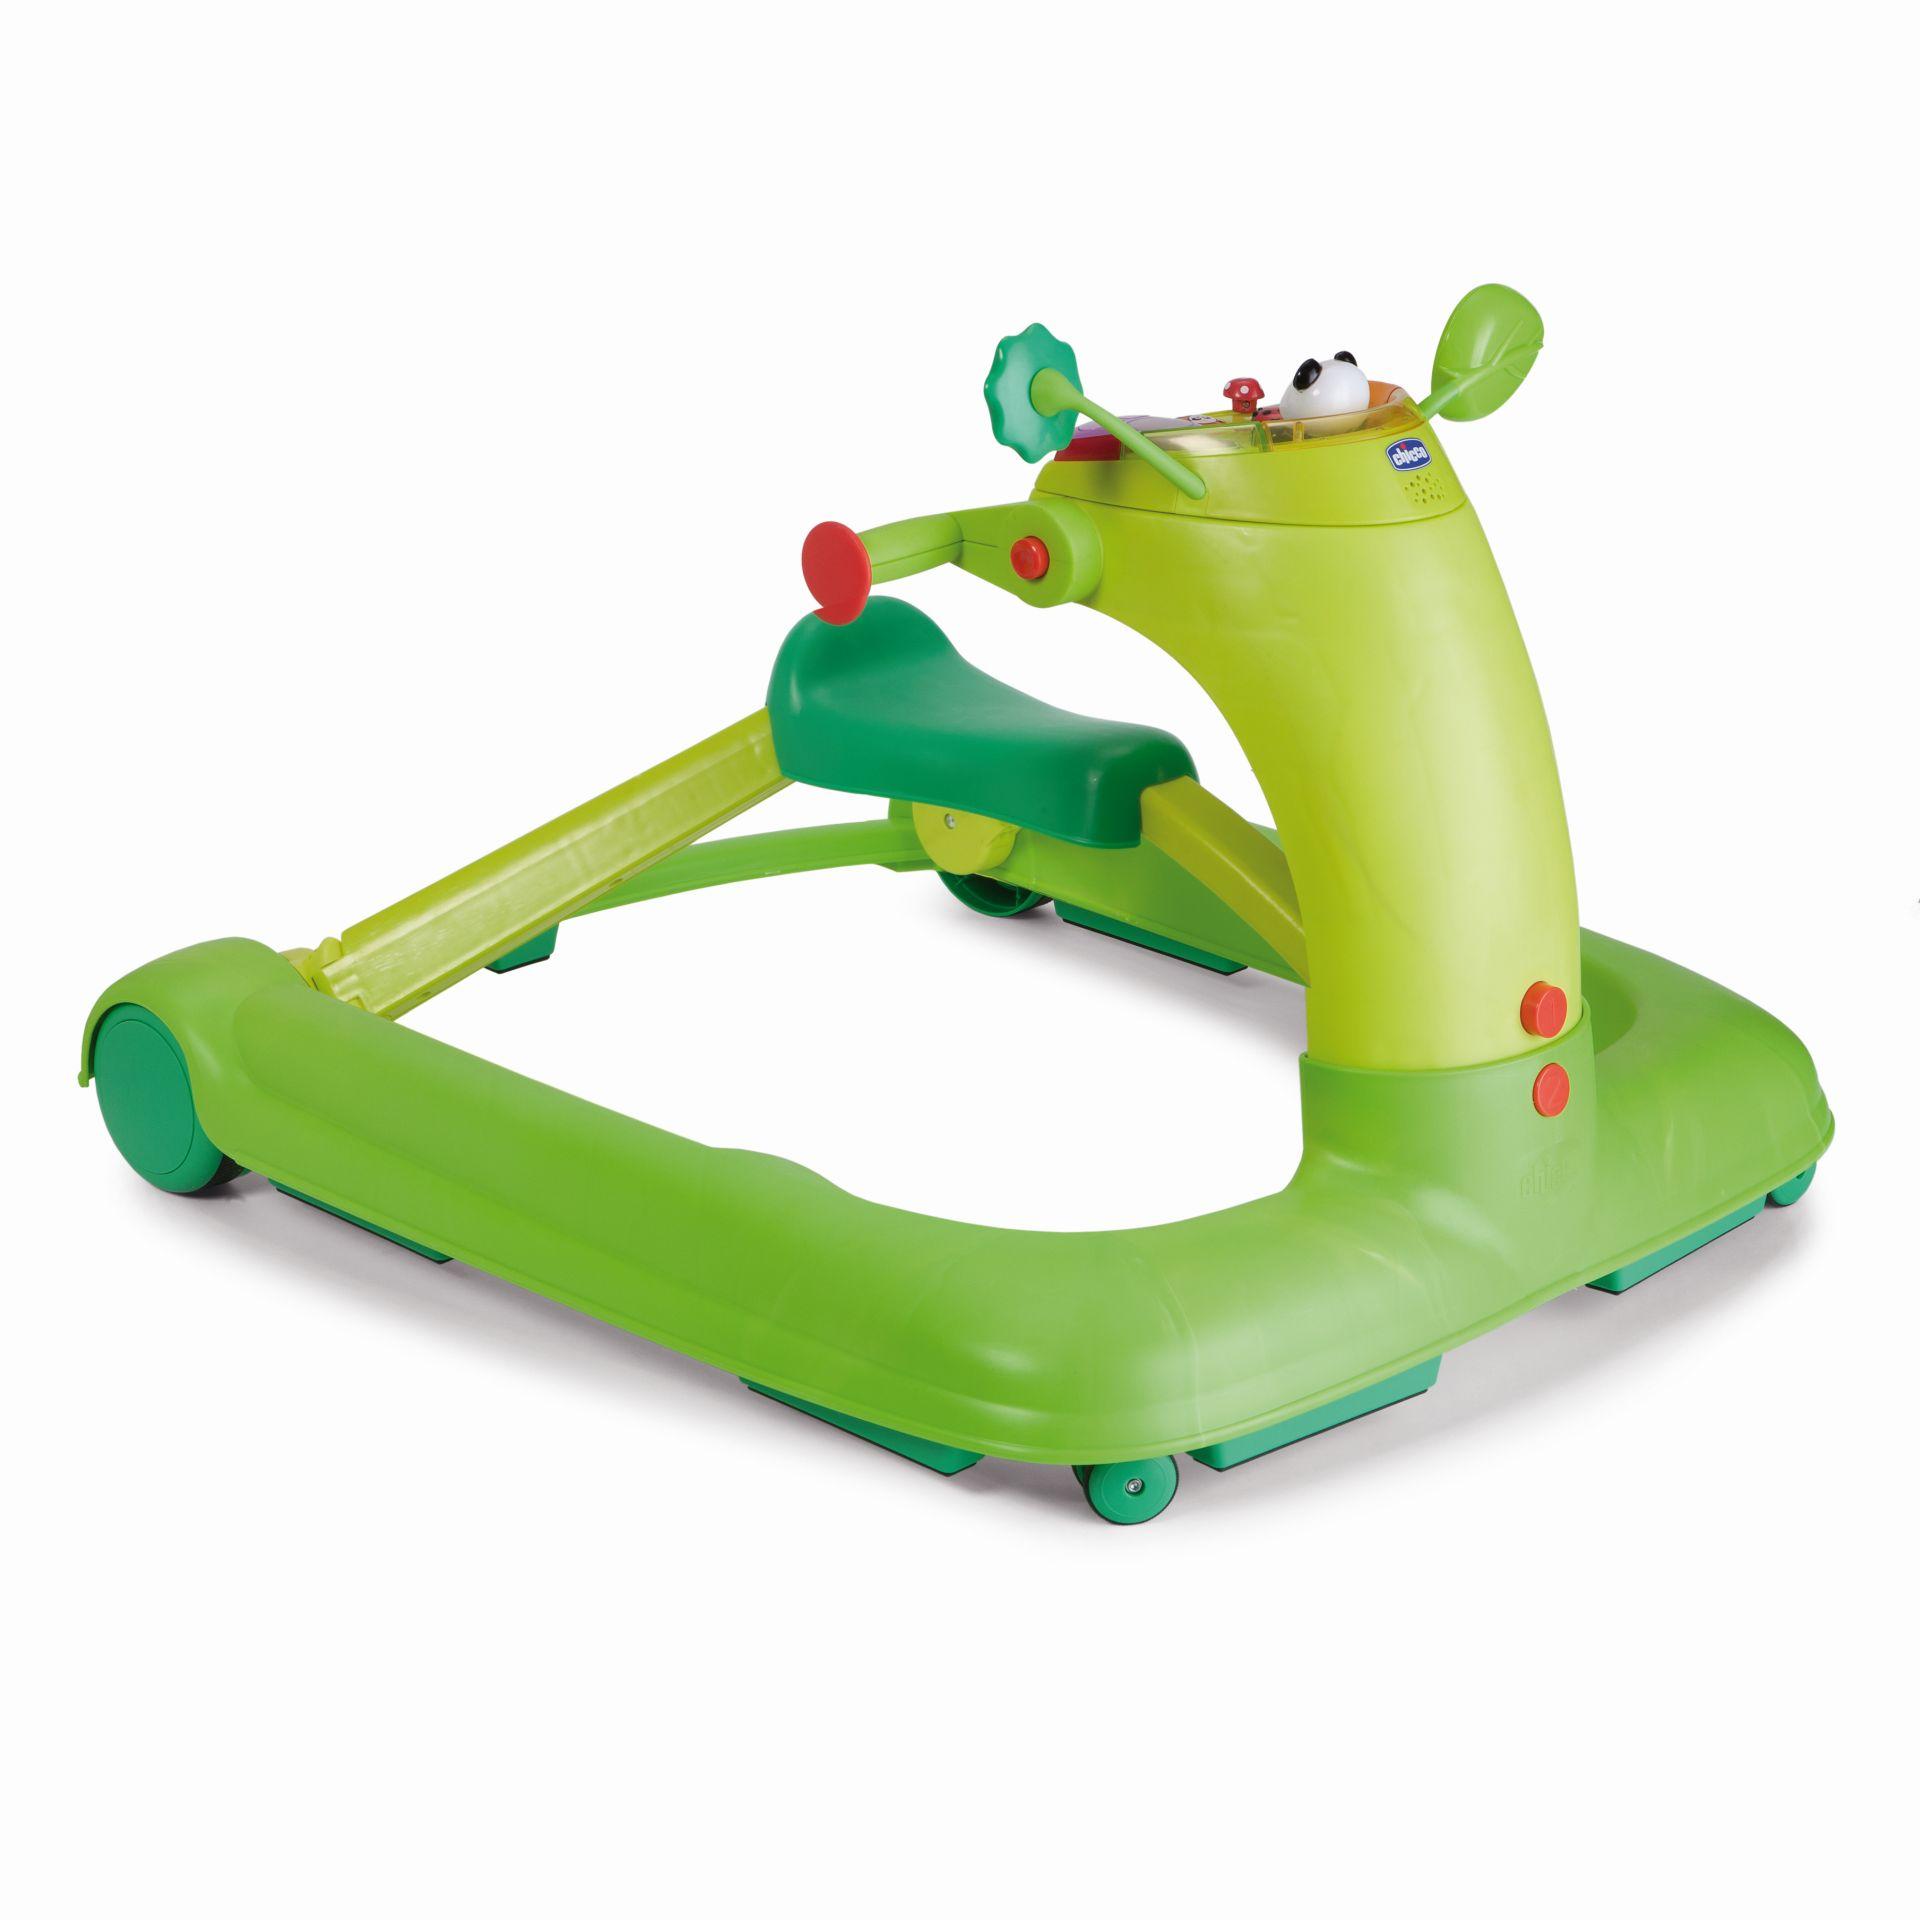 chicco baby walker 1 2 3 2018 green buy at kidsroom. Black Bedroom Furniture Sets. Home Design Ideas